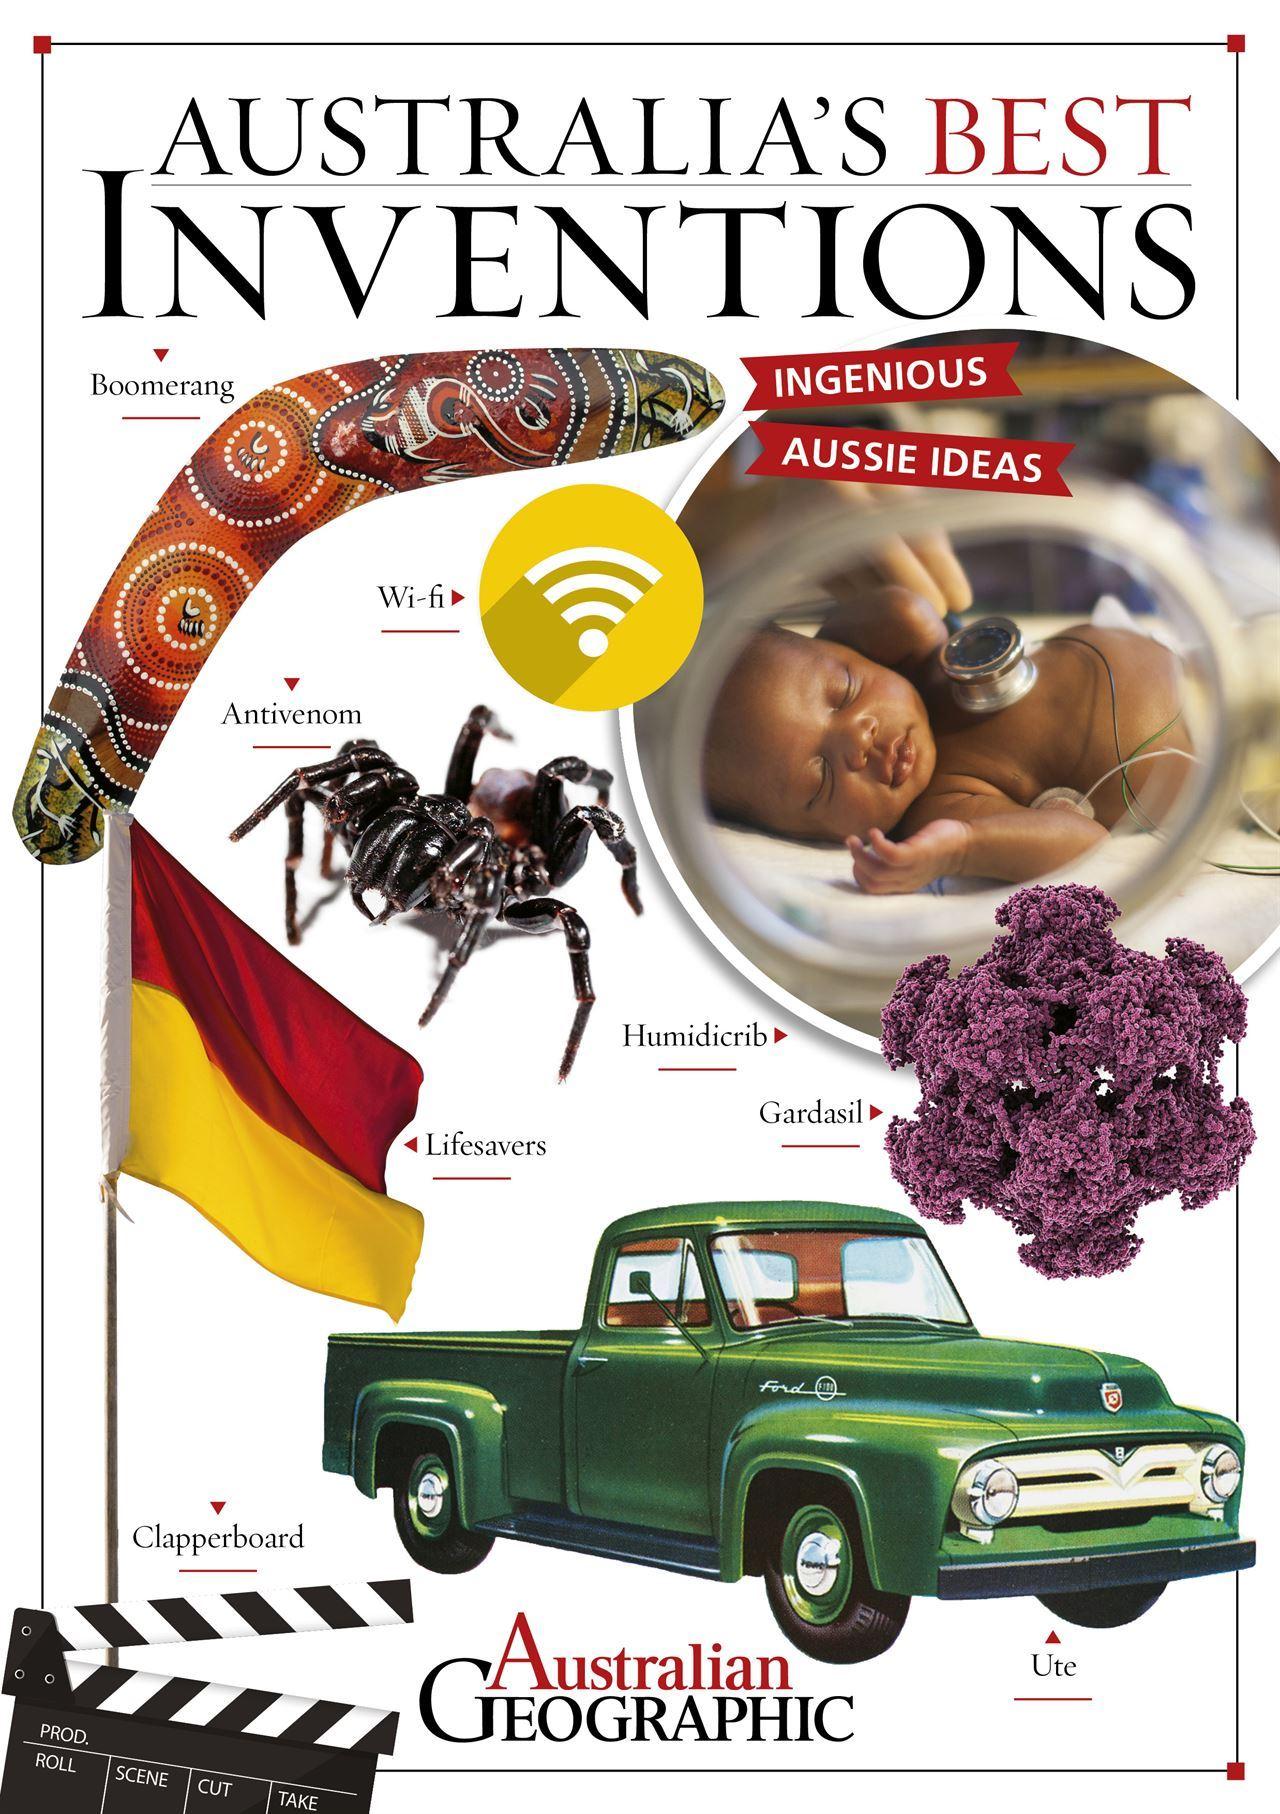 Australia's Best Inventions